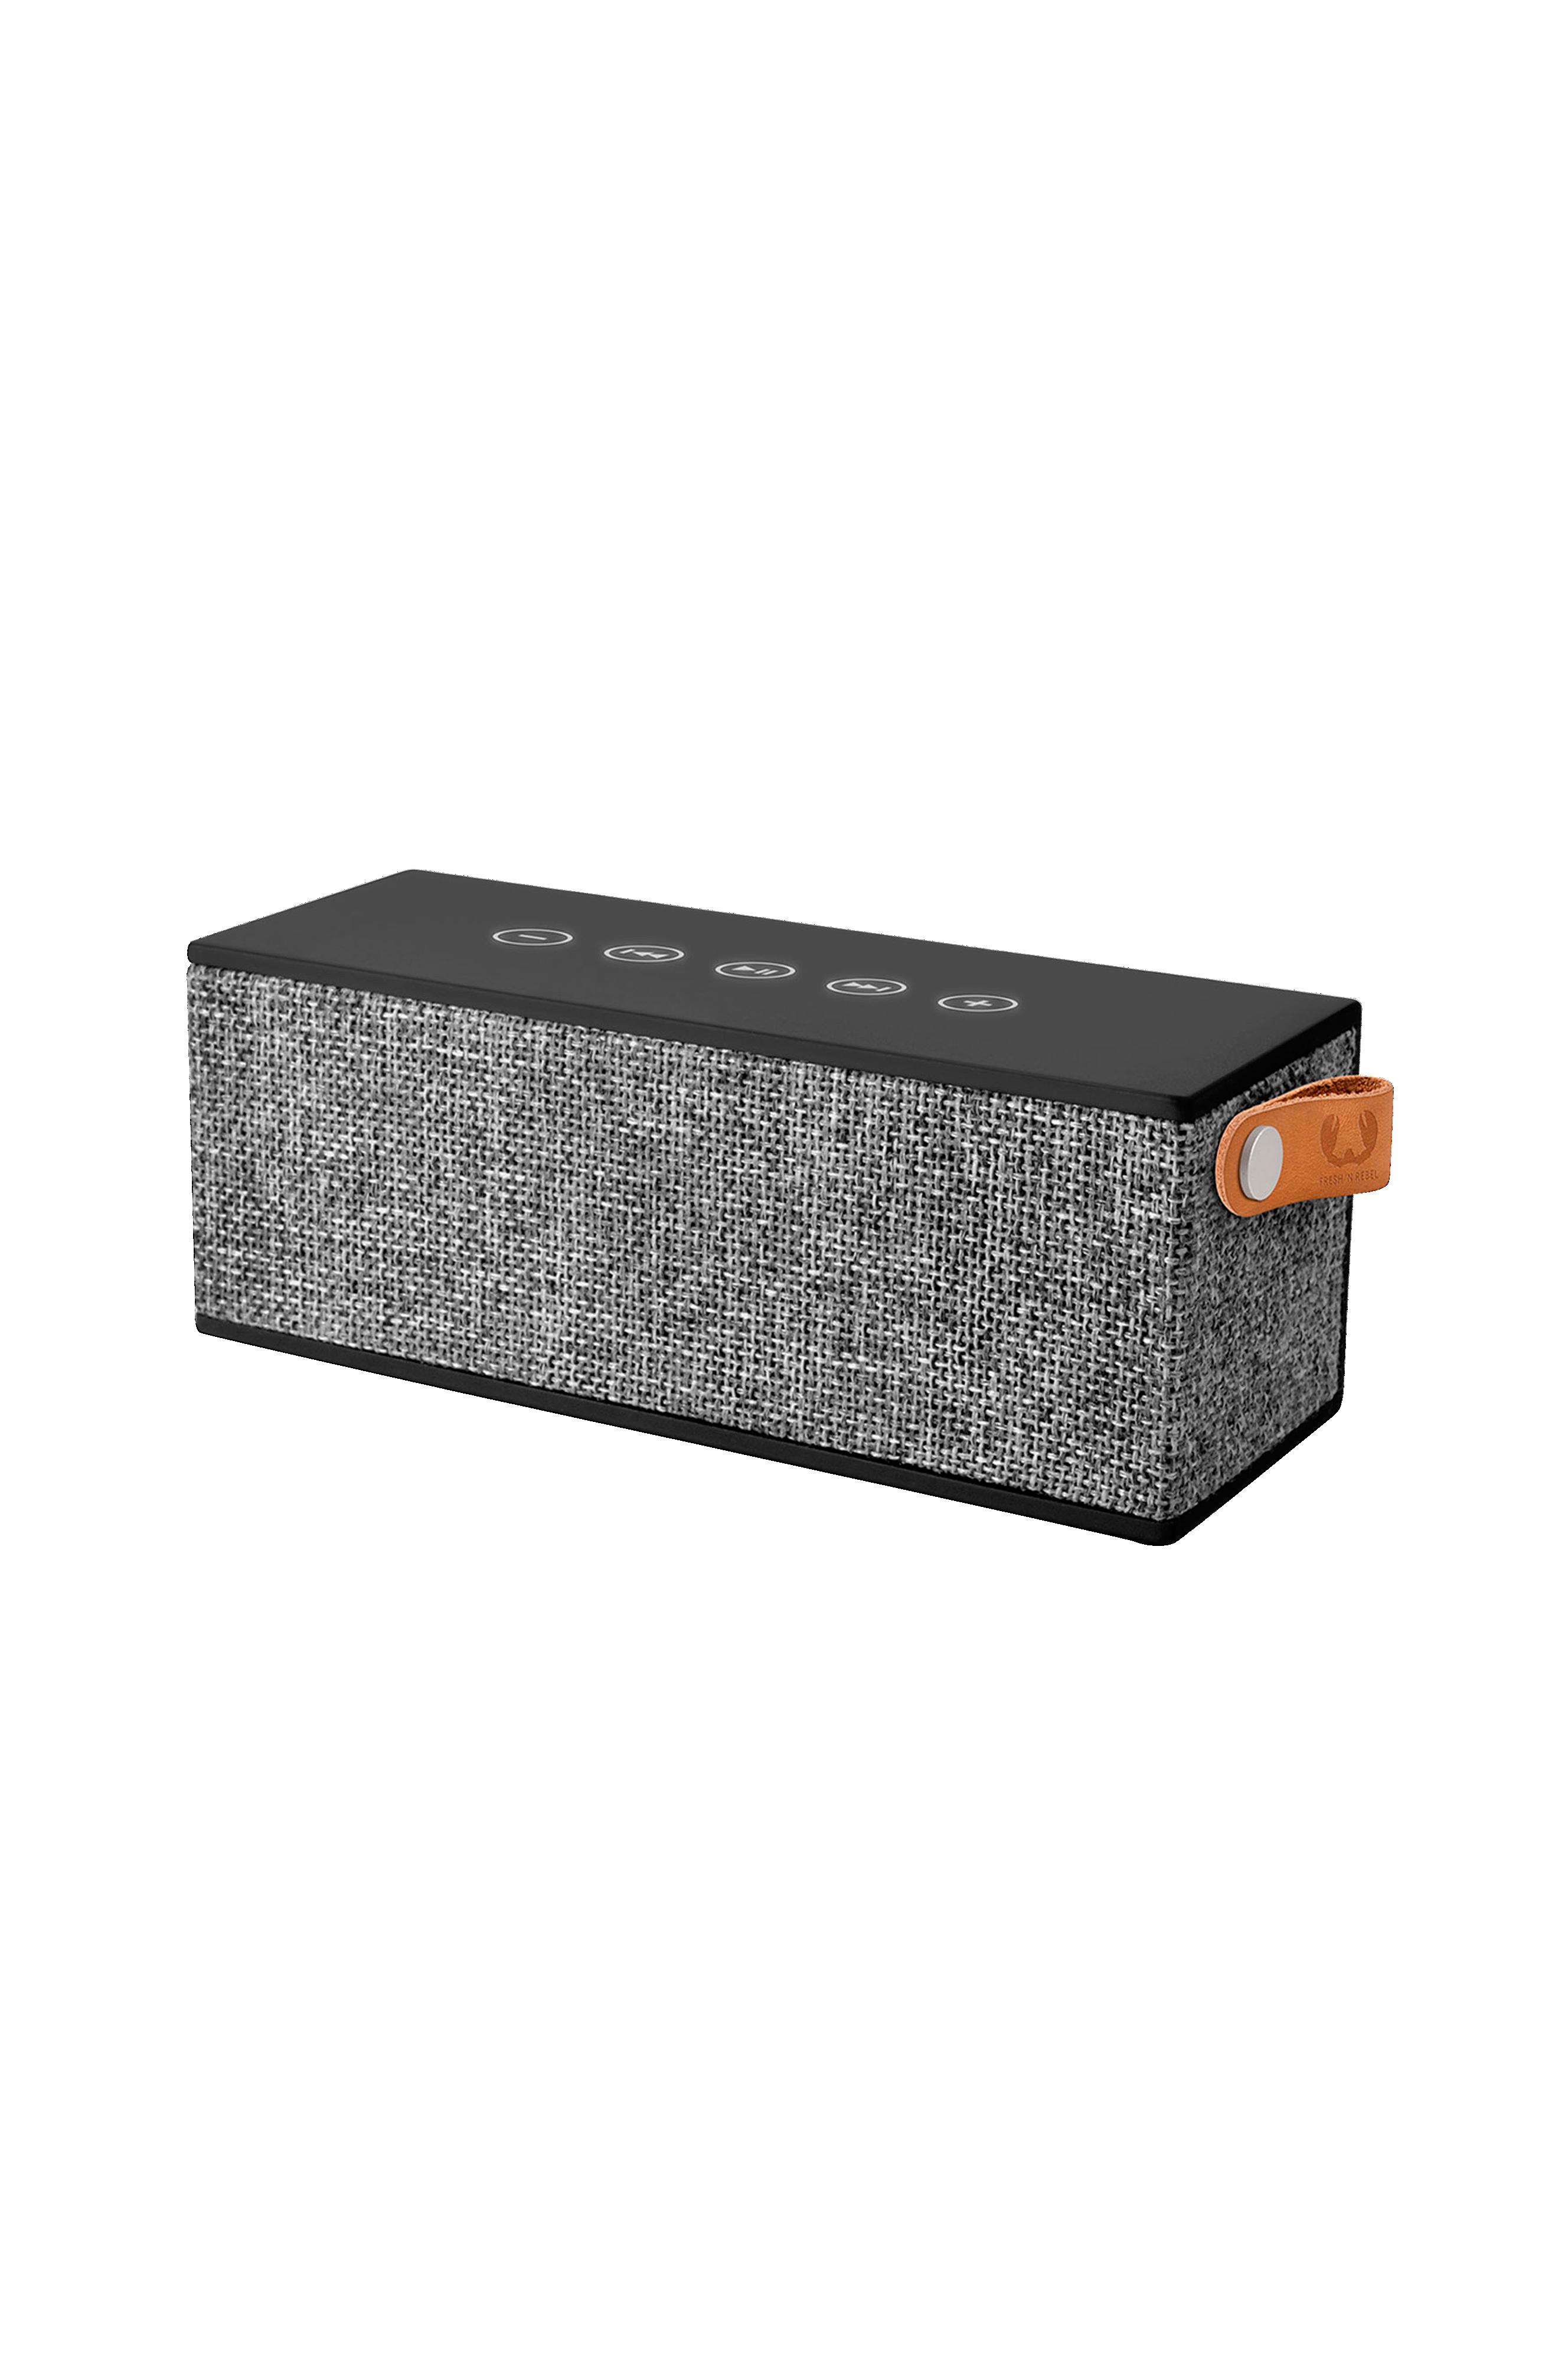 Fresh 'n Rebel Rockbox Brick Høytaler Concrete Black